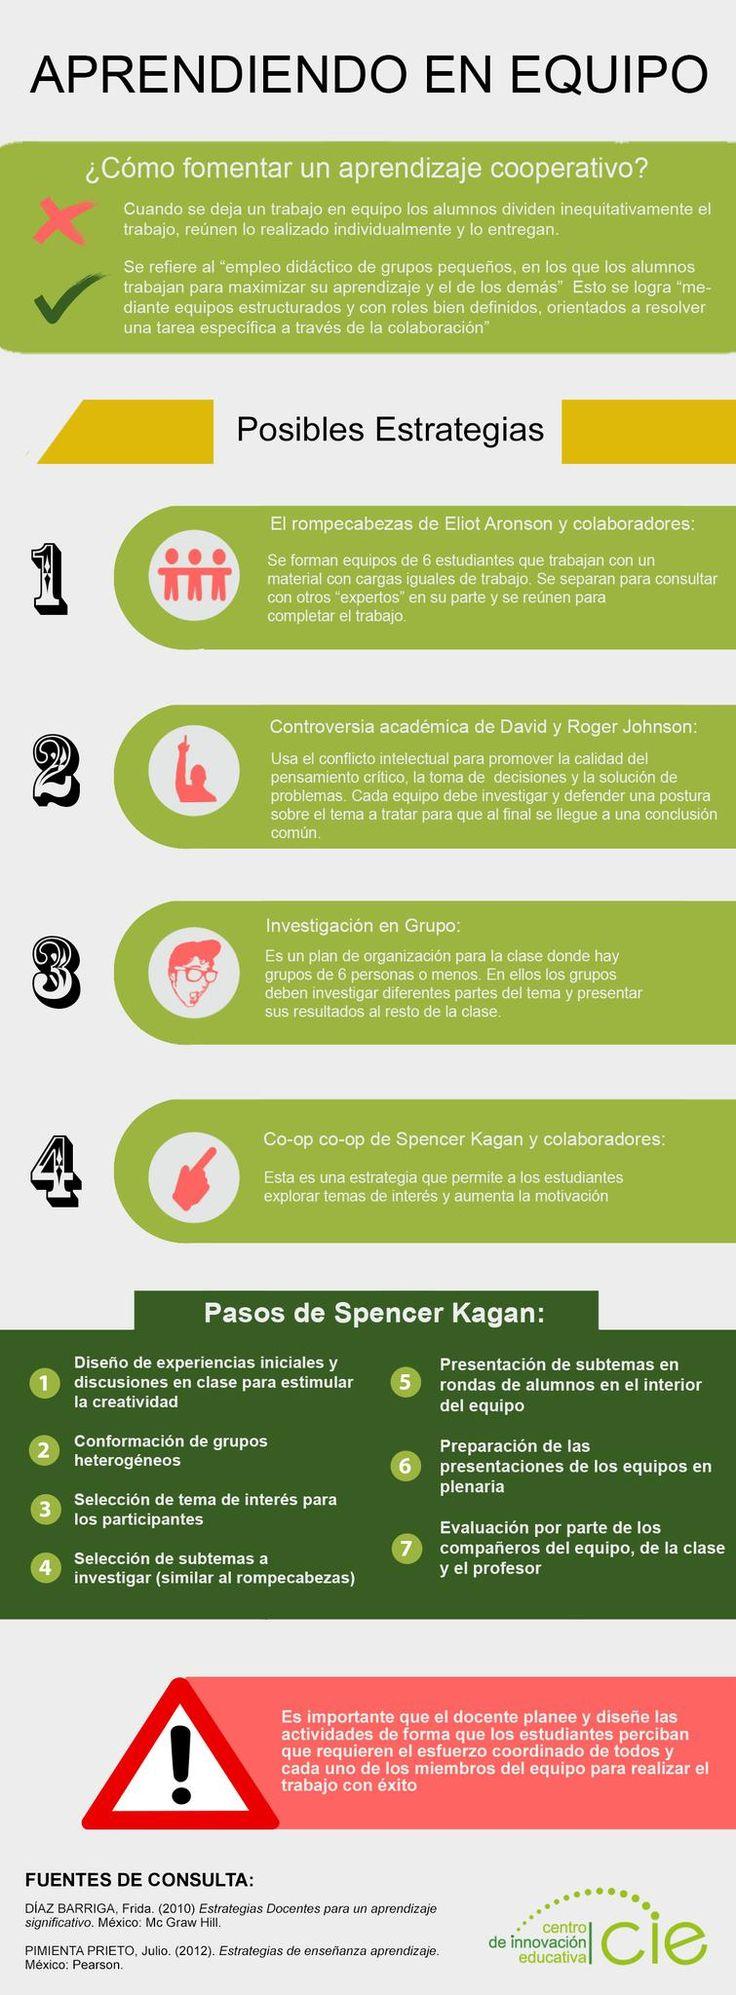 Pasos de Spencer Kagan para empezar a aplicar el Aprendizaje Cooperativo #infografia http://cie.up.edu.mx/es/aprende/c-mo-fomentar-en-mis-clases-el-aprendizaje-cooperativo …